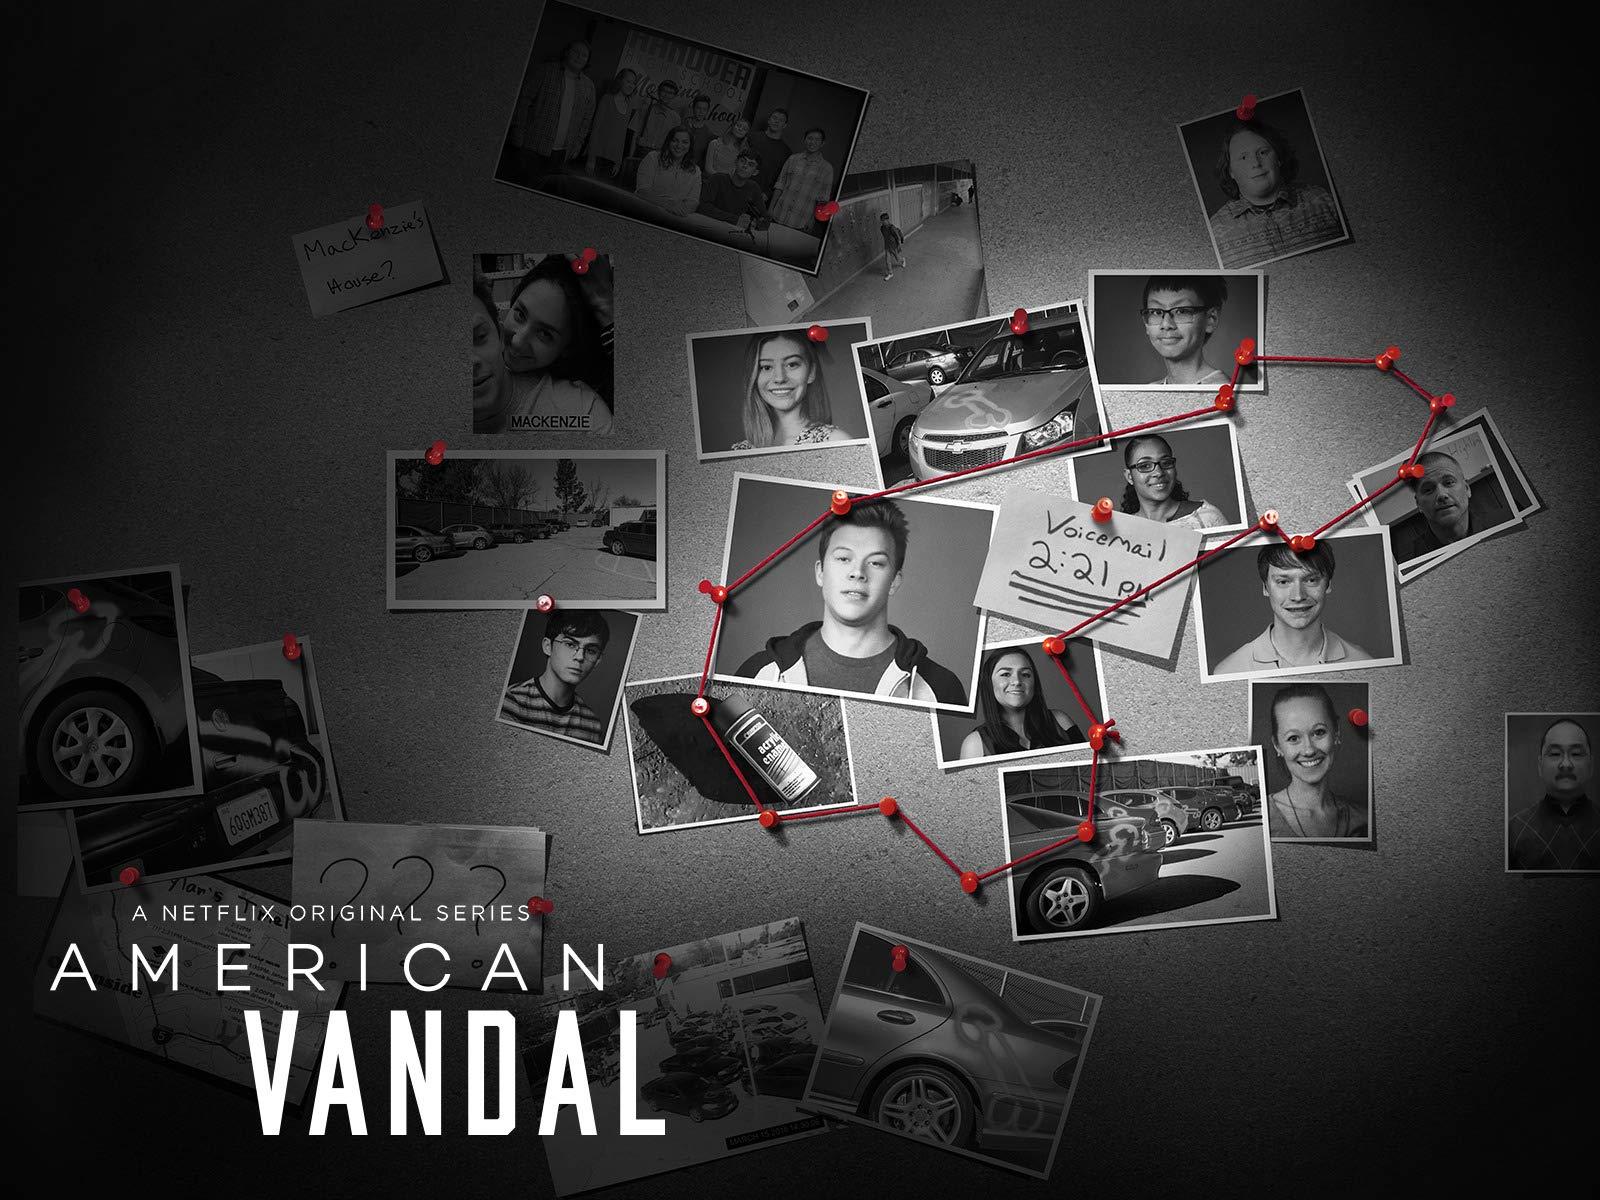 Amazoncom Watch American Vandal Season 1 Prime Video 1600x1200